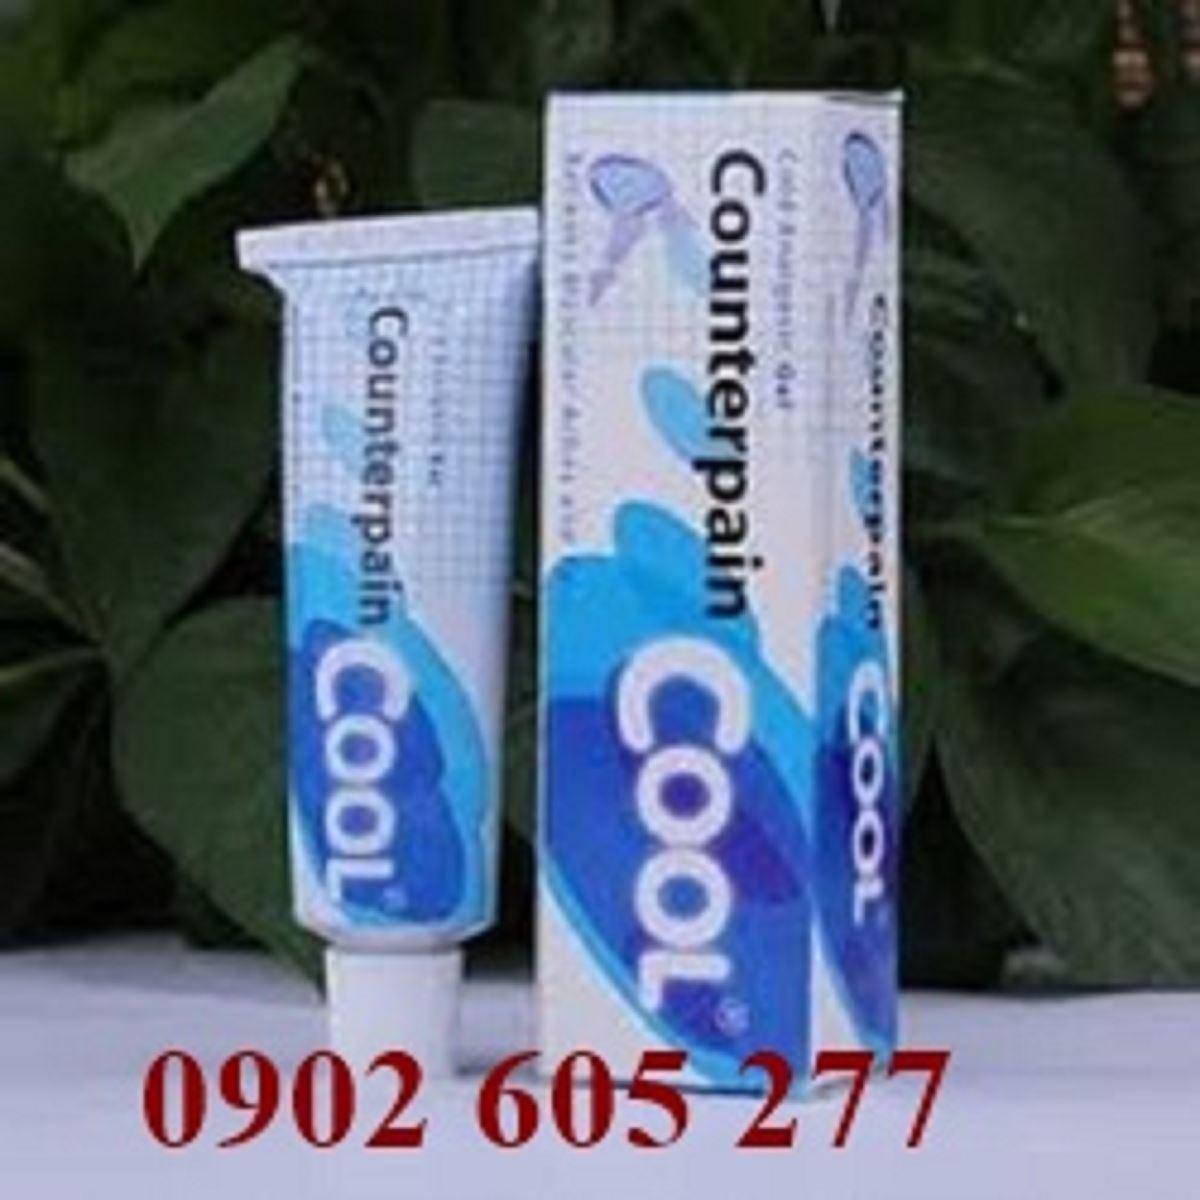 Cao xoa bóp Couterpain Cool Thái Lan